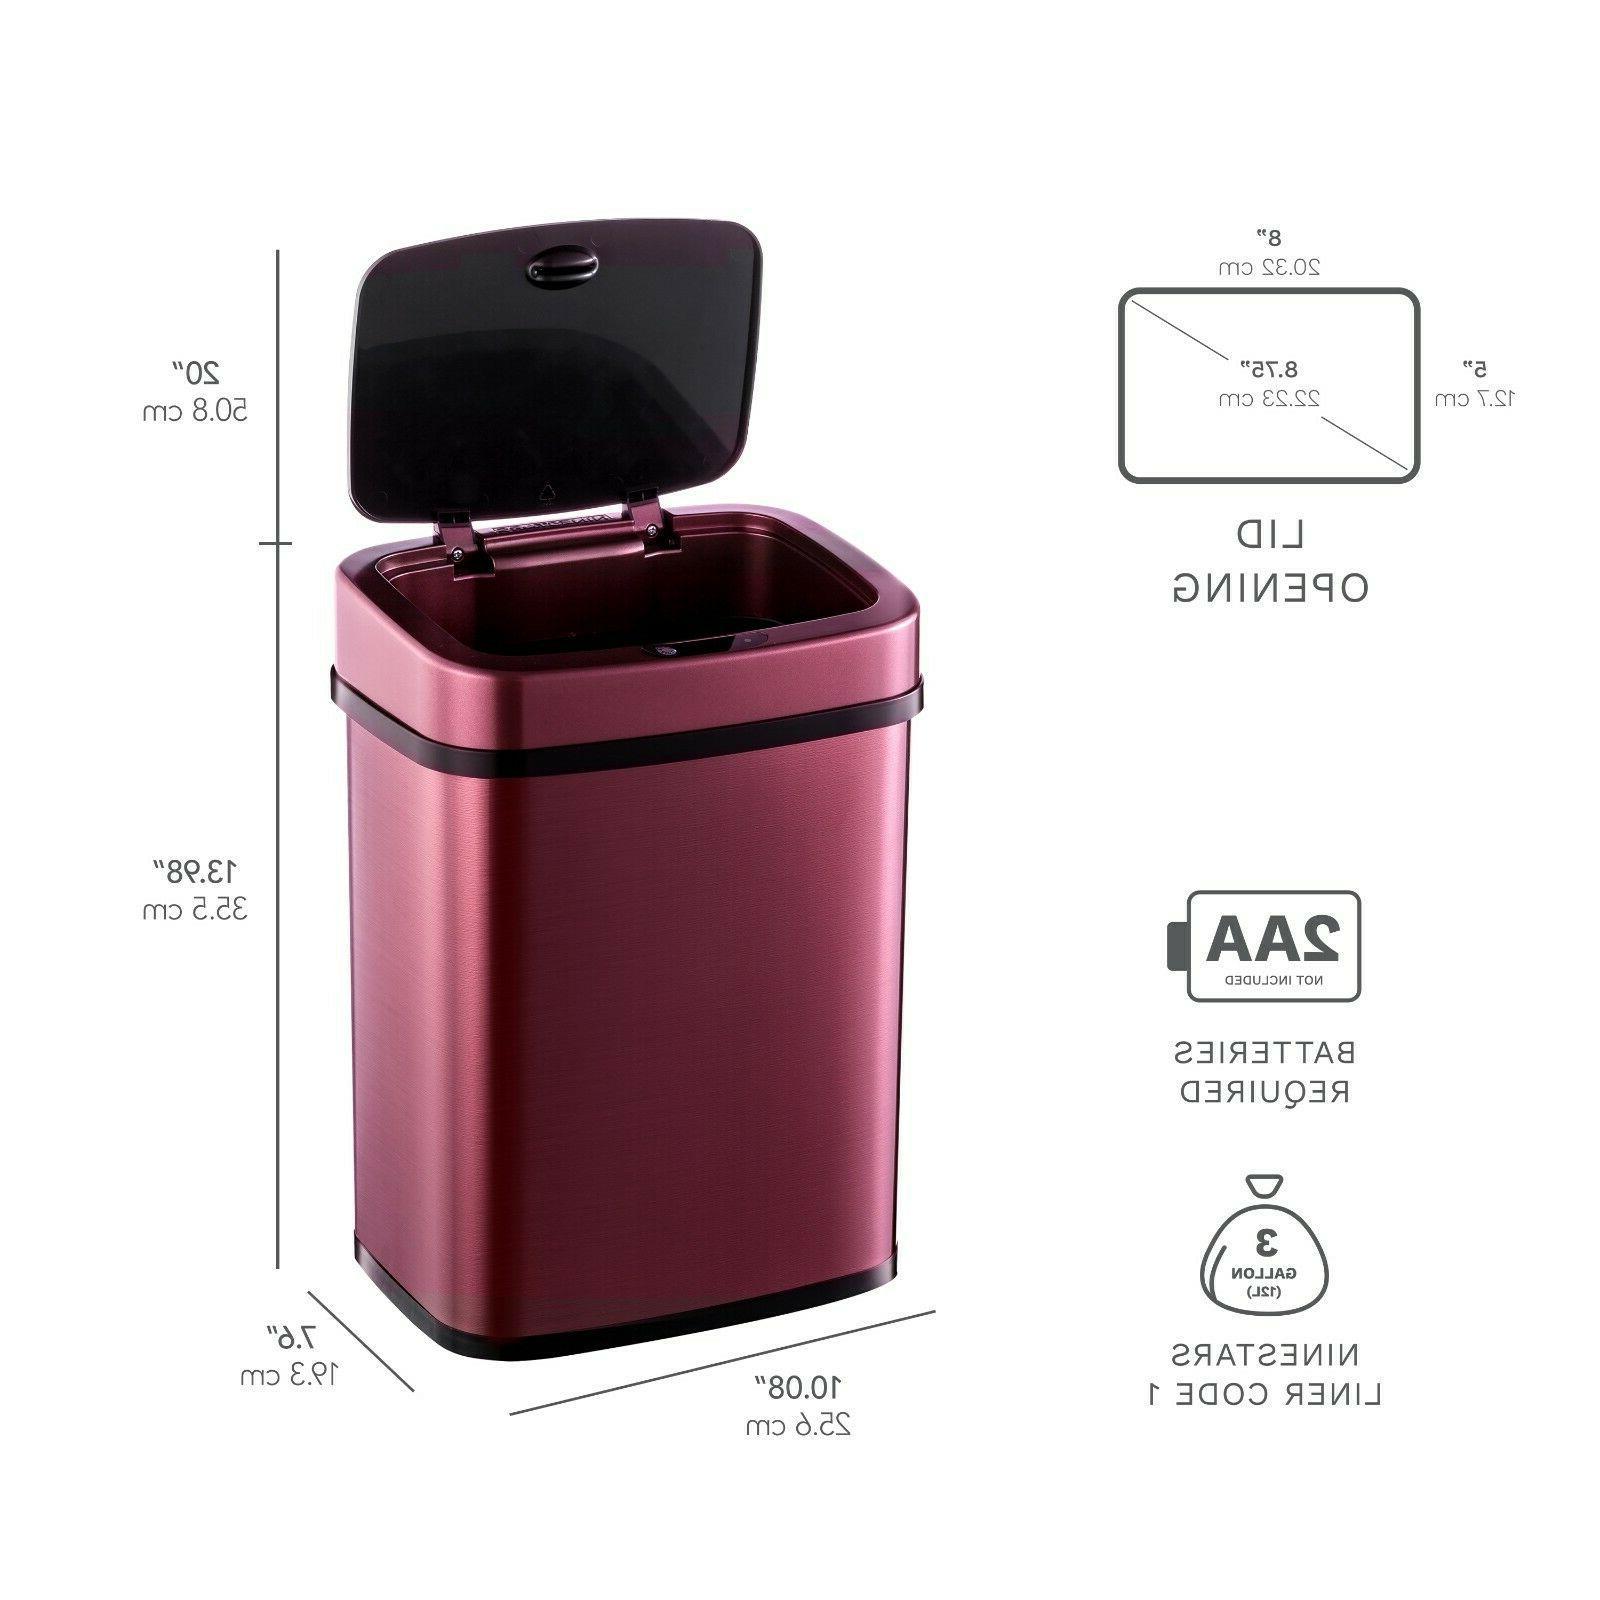 Ninestars Automatic Touchless Sensor Trash